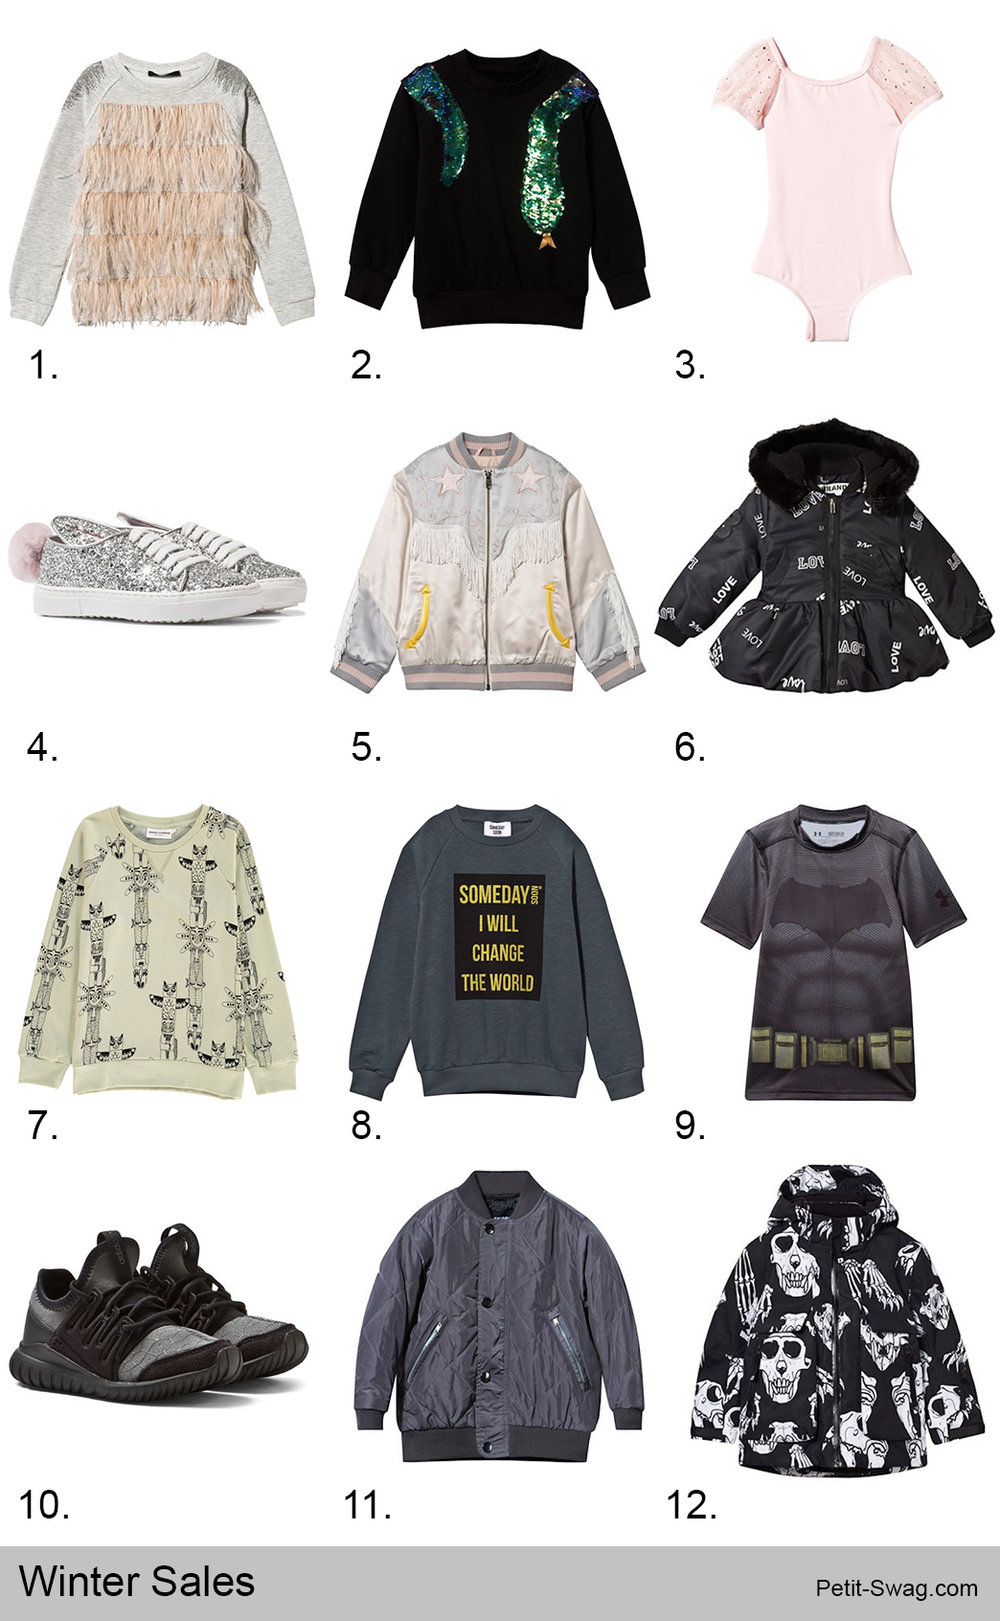 Winter Sales | Petit-Swag.com